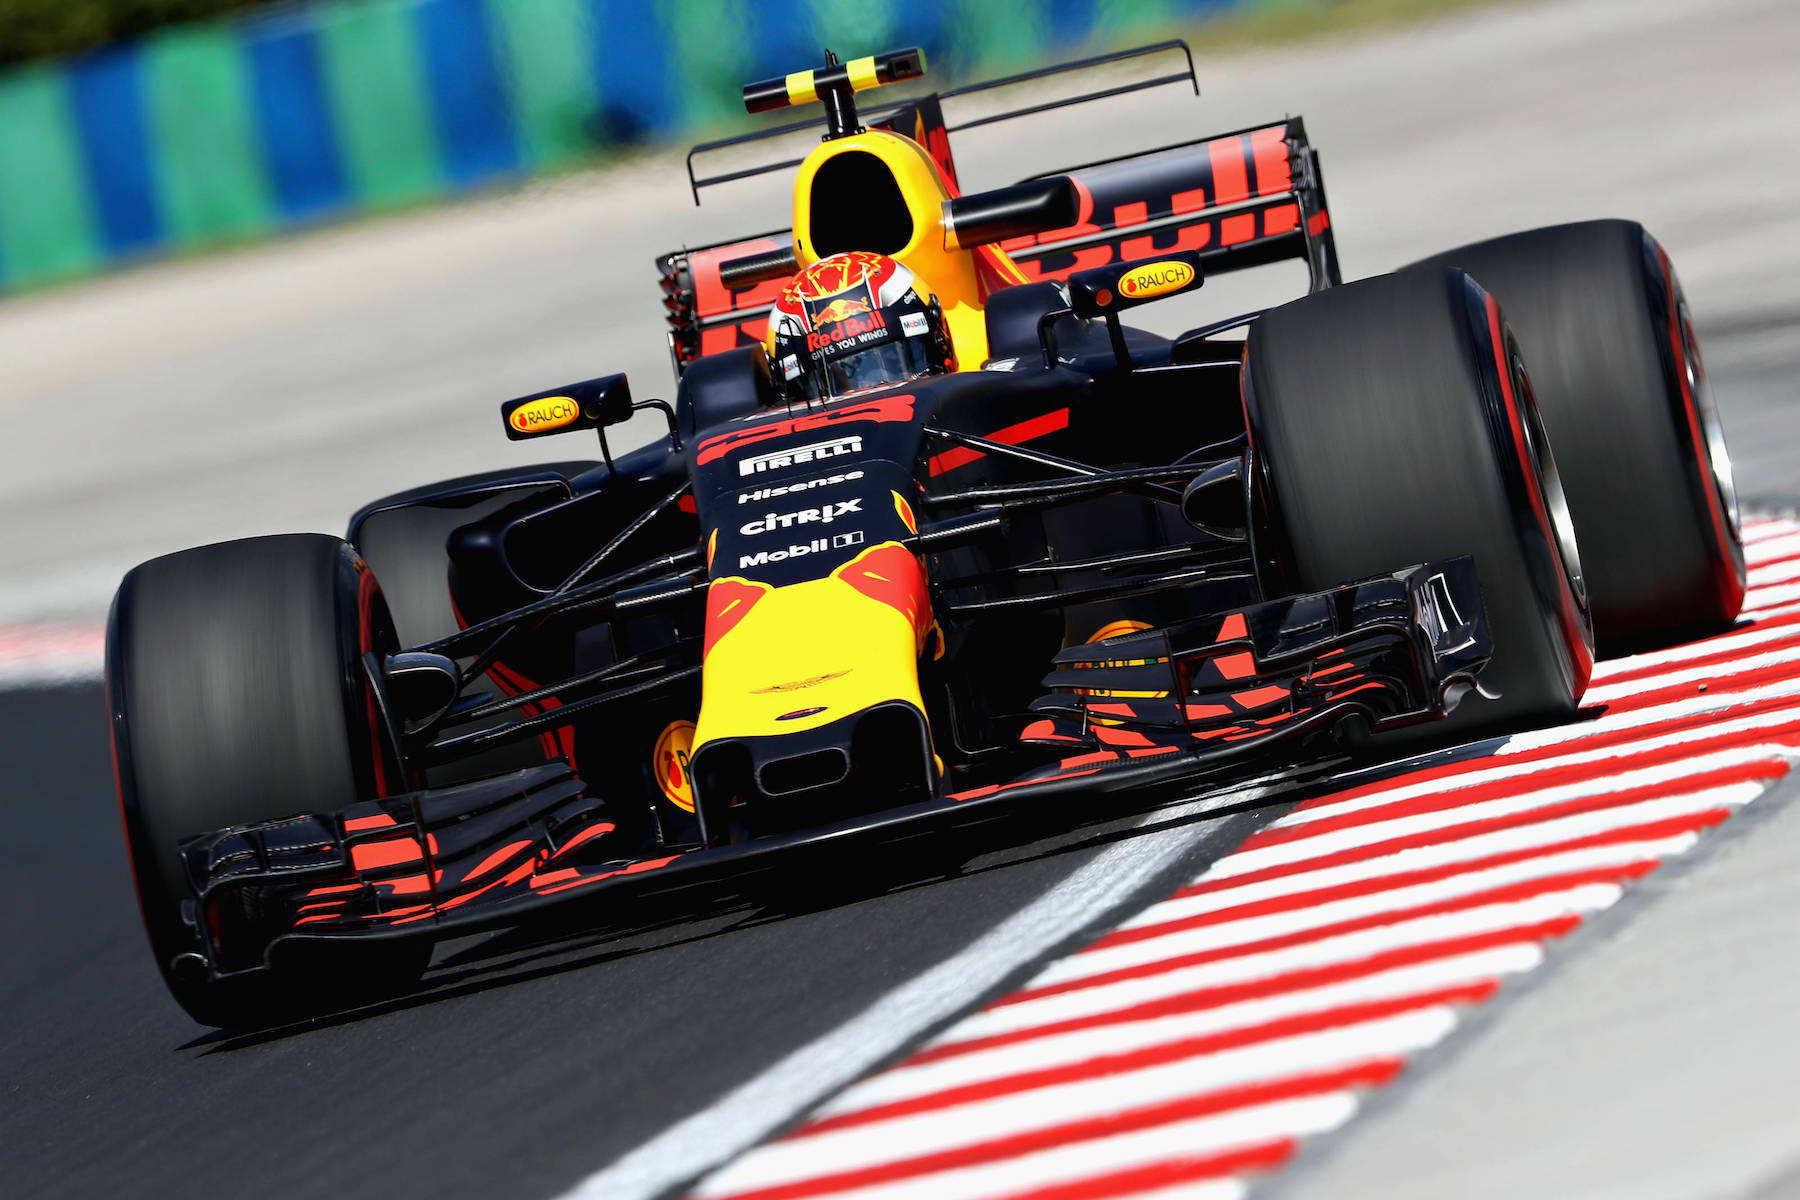 2017 Max Verstappen | Red Bull RB13 | 2017 Hungarian GP FP1 1 copy.jpg